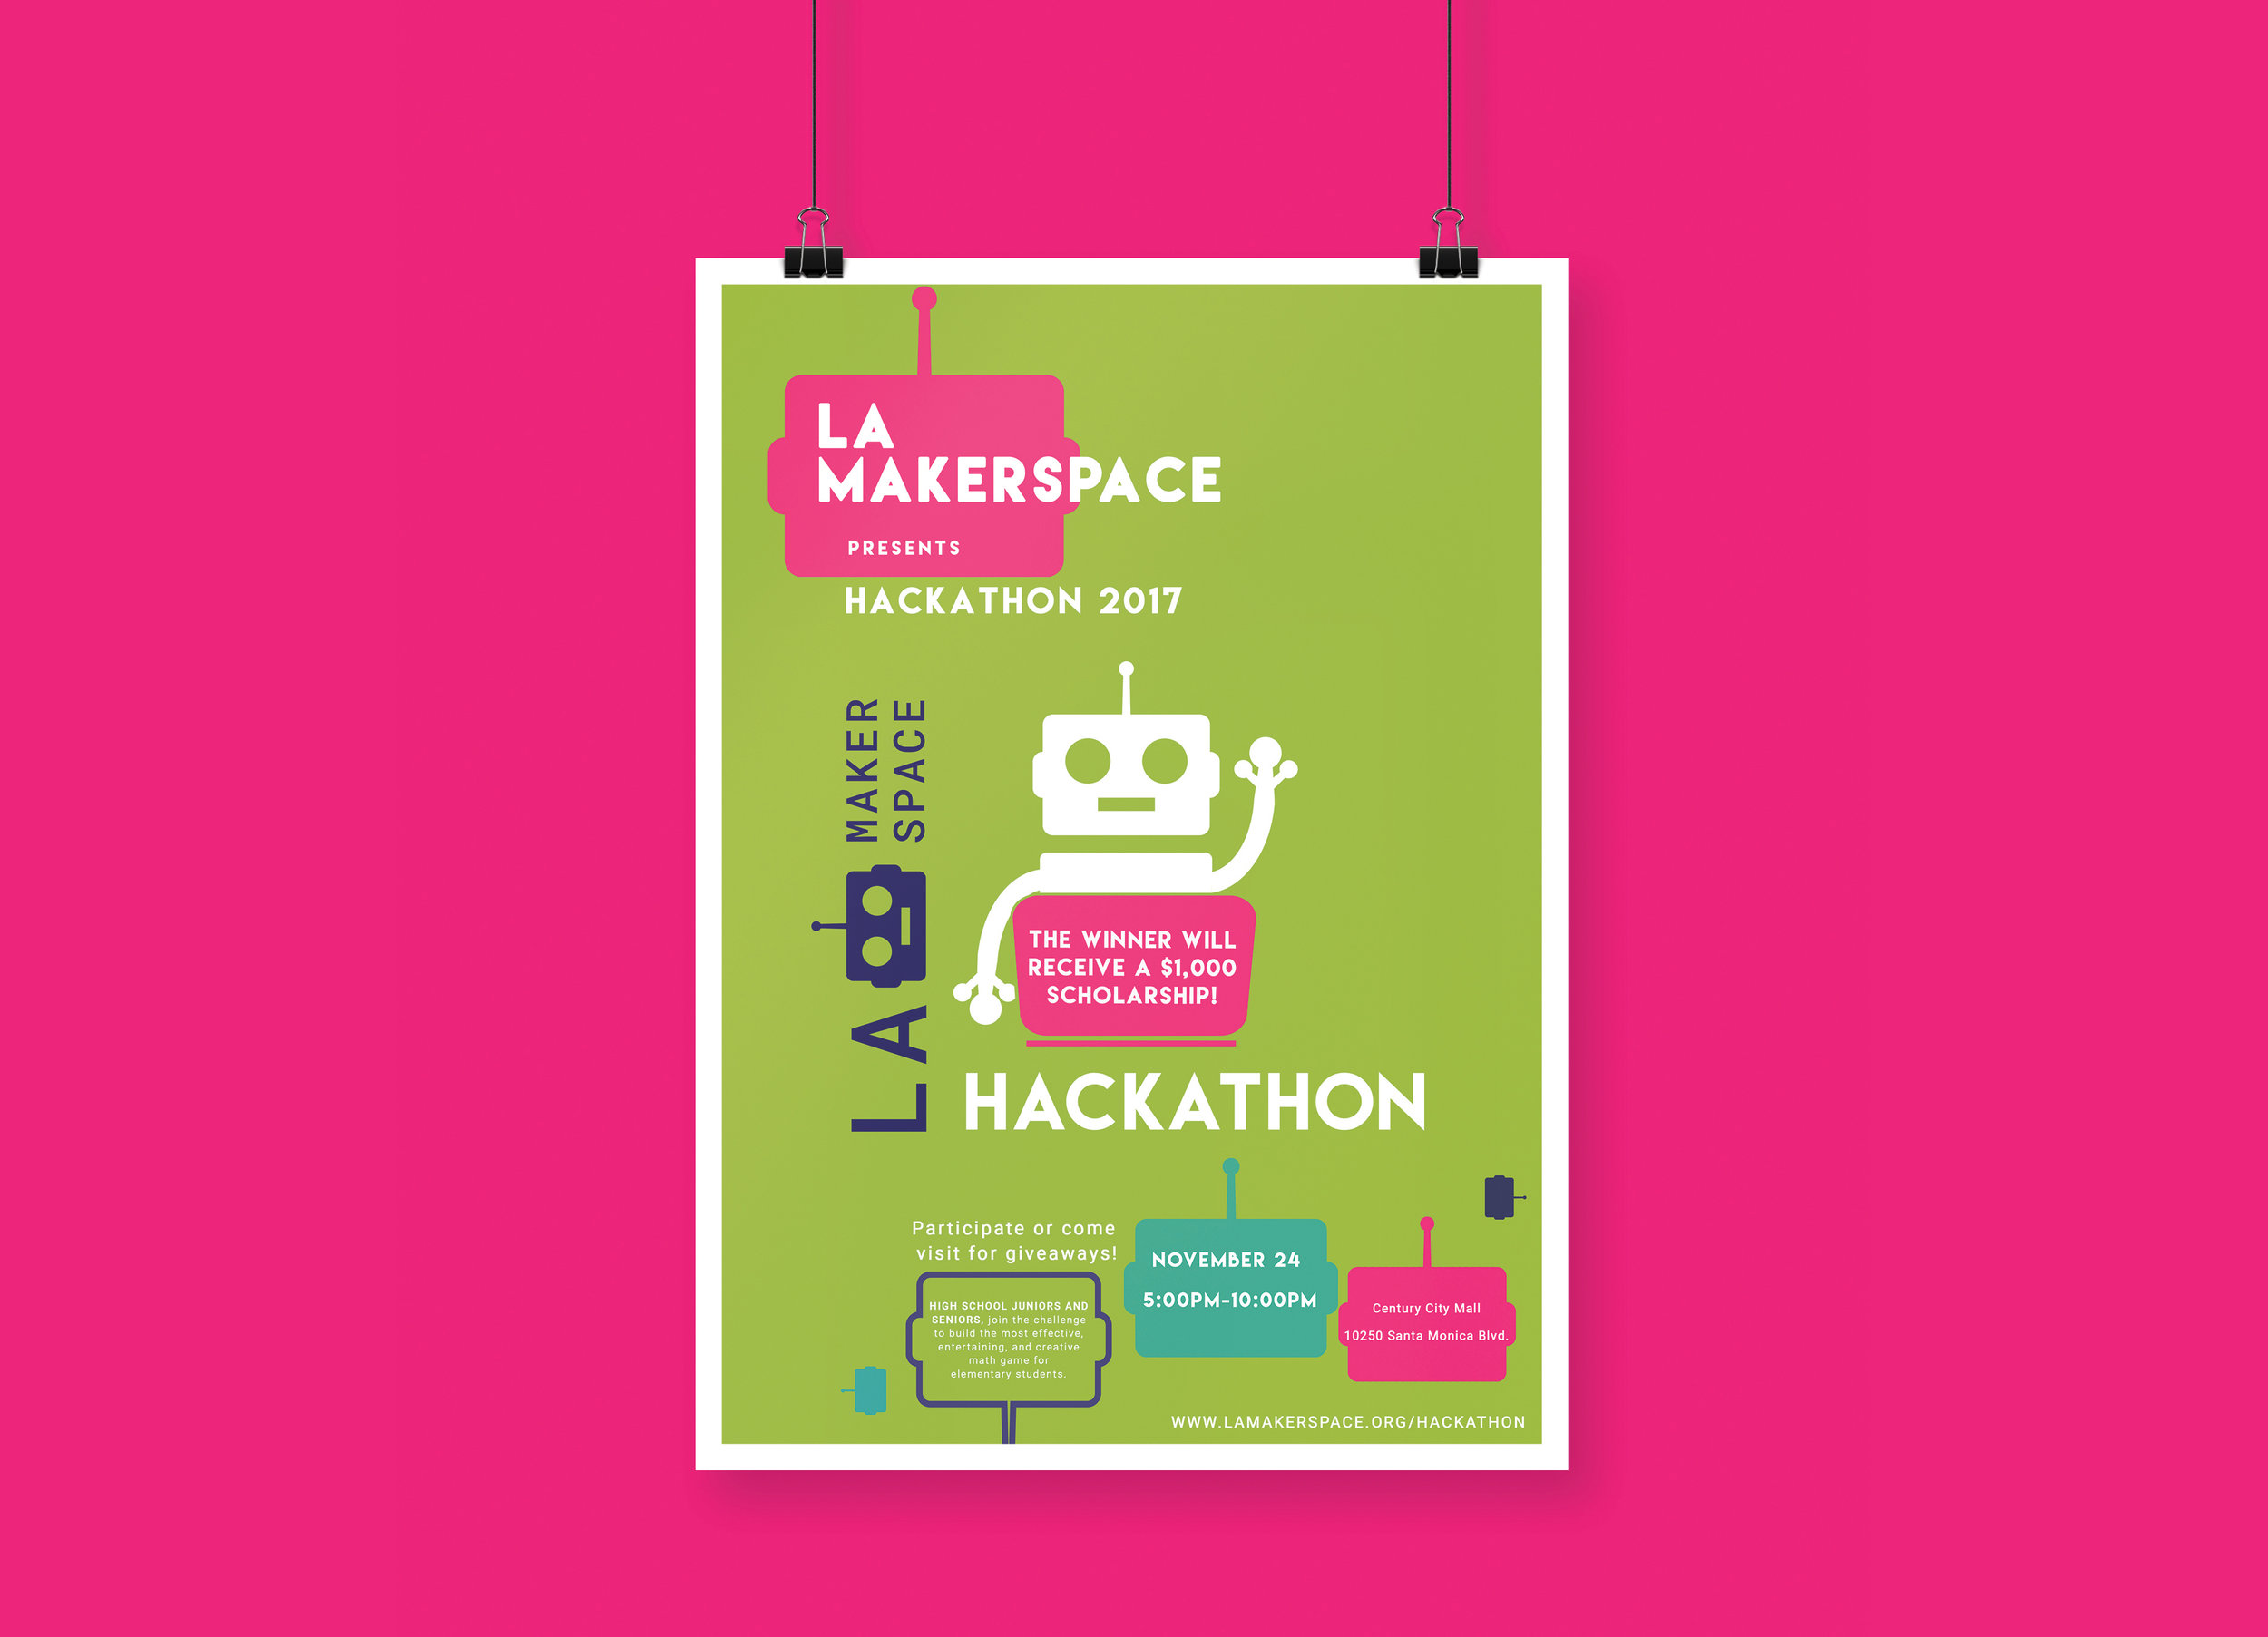 shadalene-la-makerspace-mockup-4-RGB copy.jpg